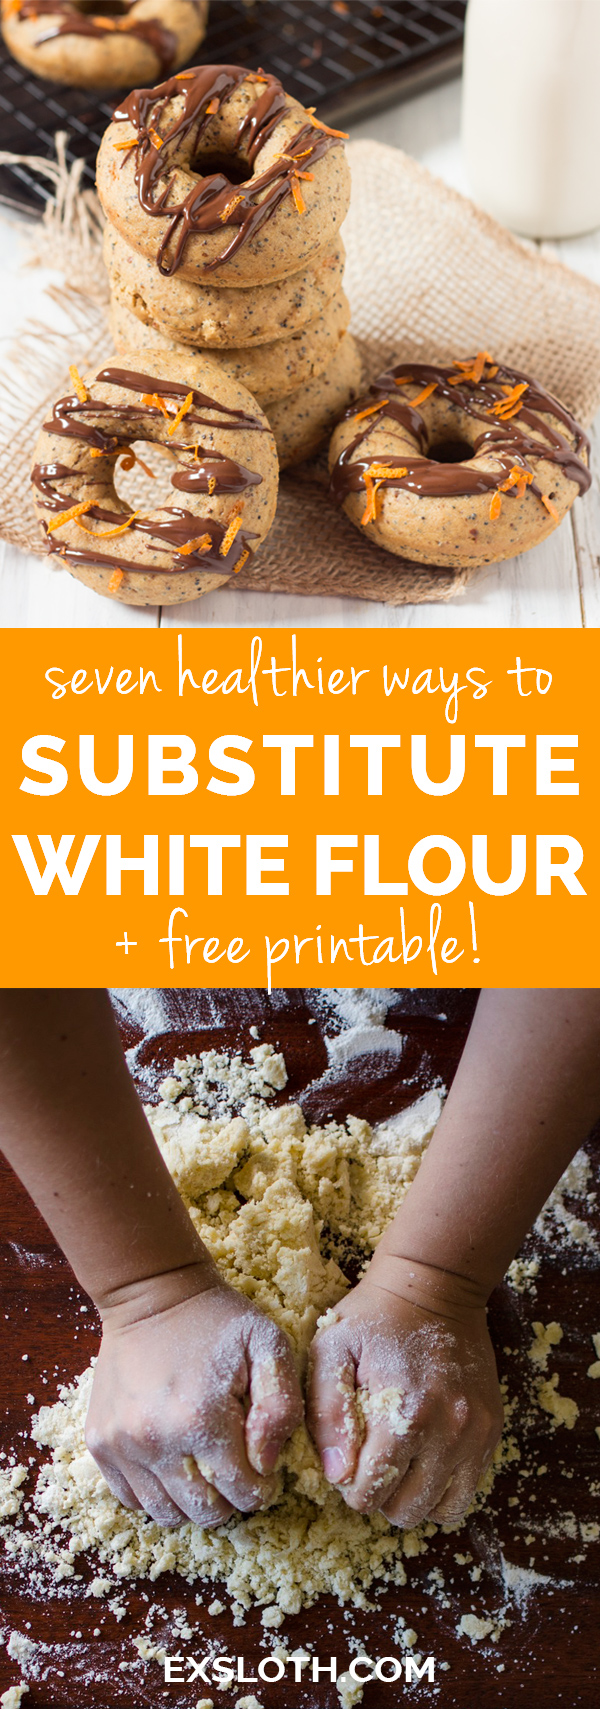 7 healthier ways to replace white flour when baking (whole wheat, spelt, oats and mroe) via @ExSloth | ExSloth.com